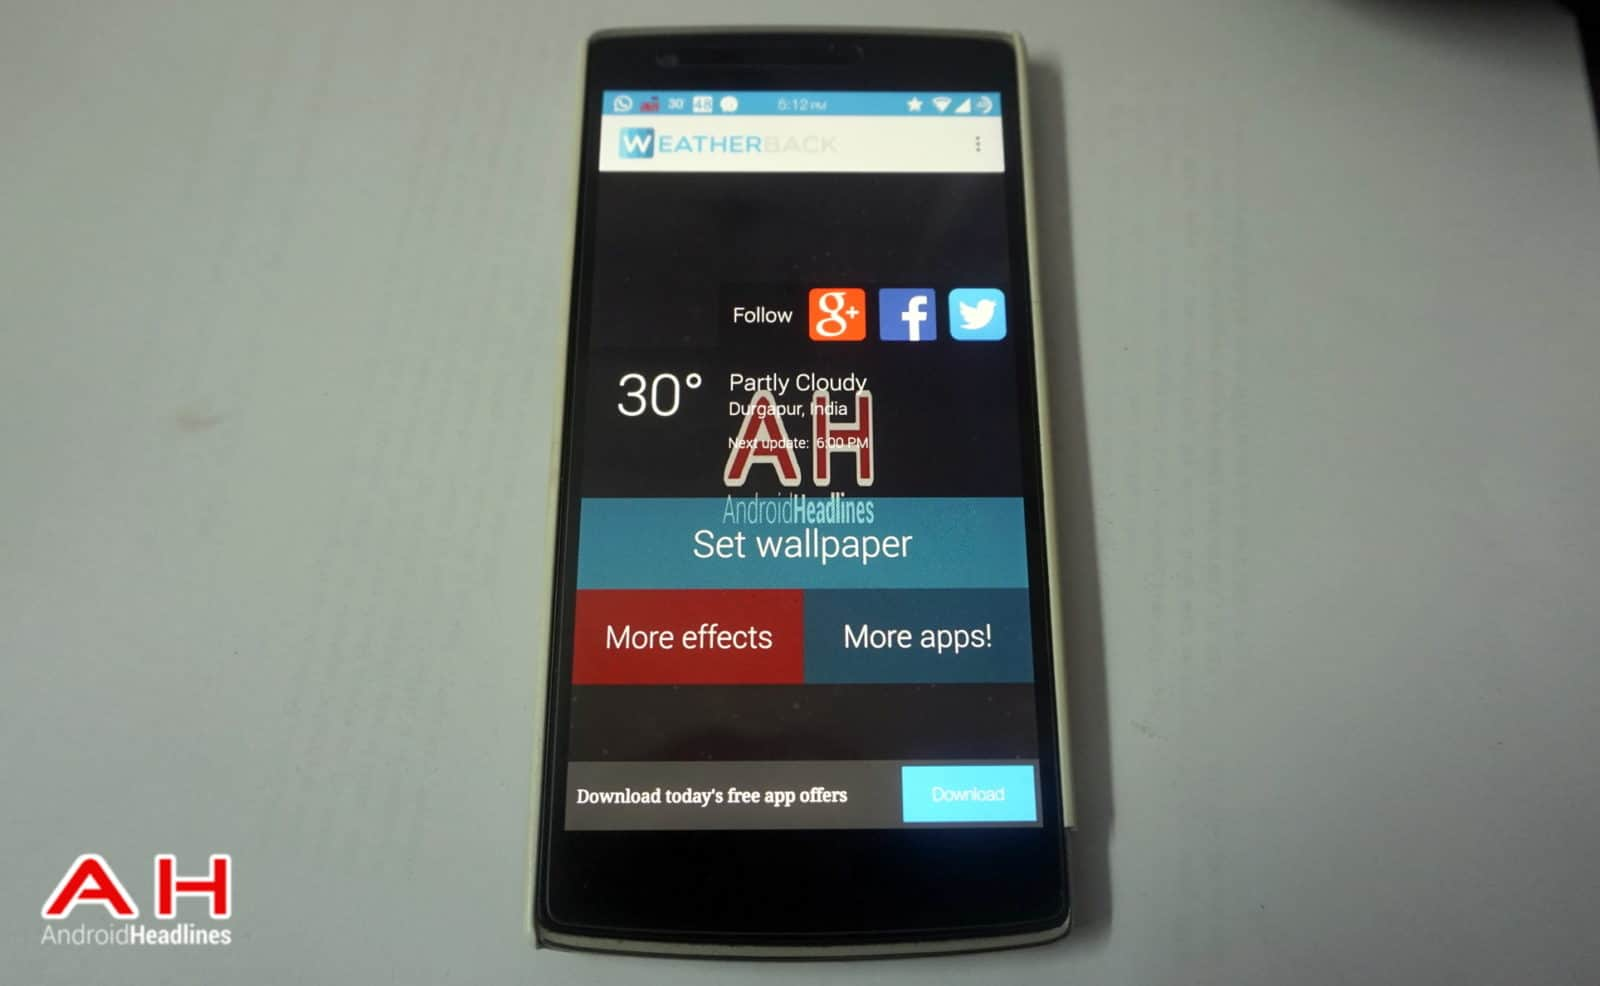 Weatherback App Cover